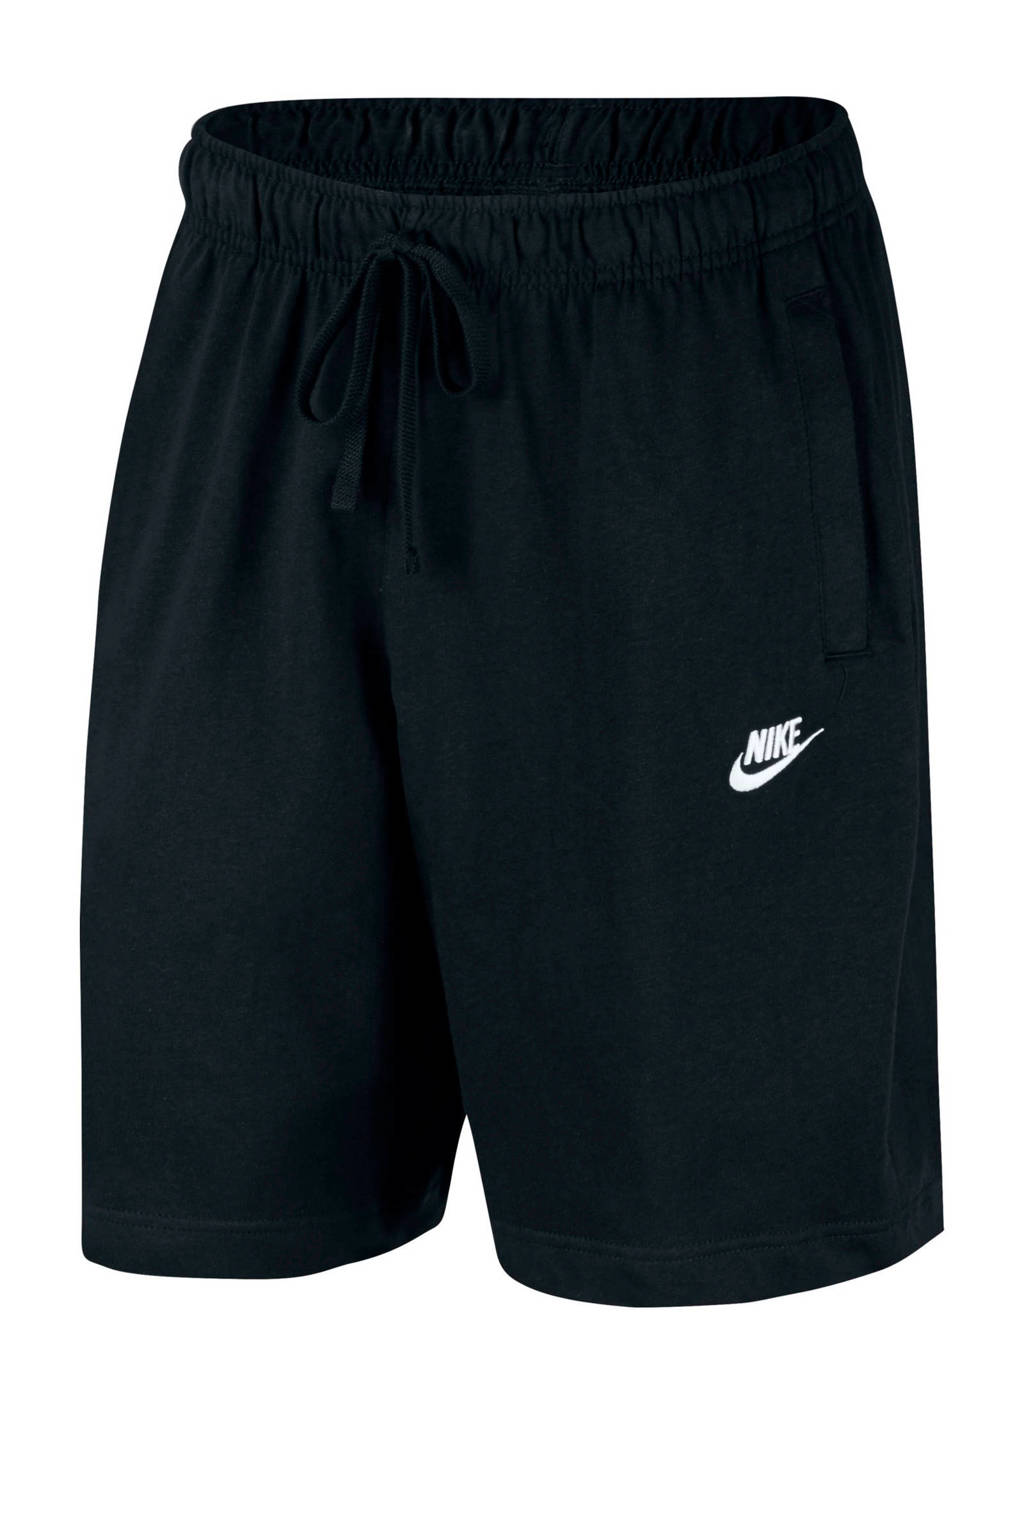 Nike short zwart, Zwart/wit